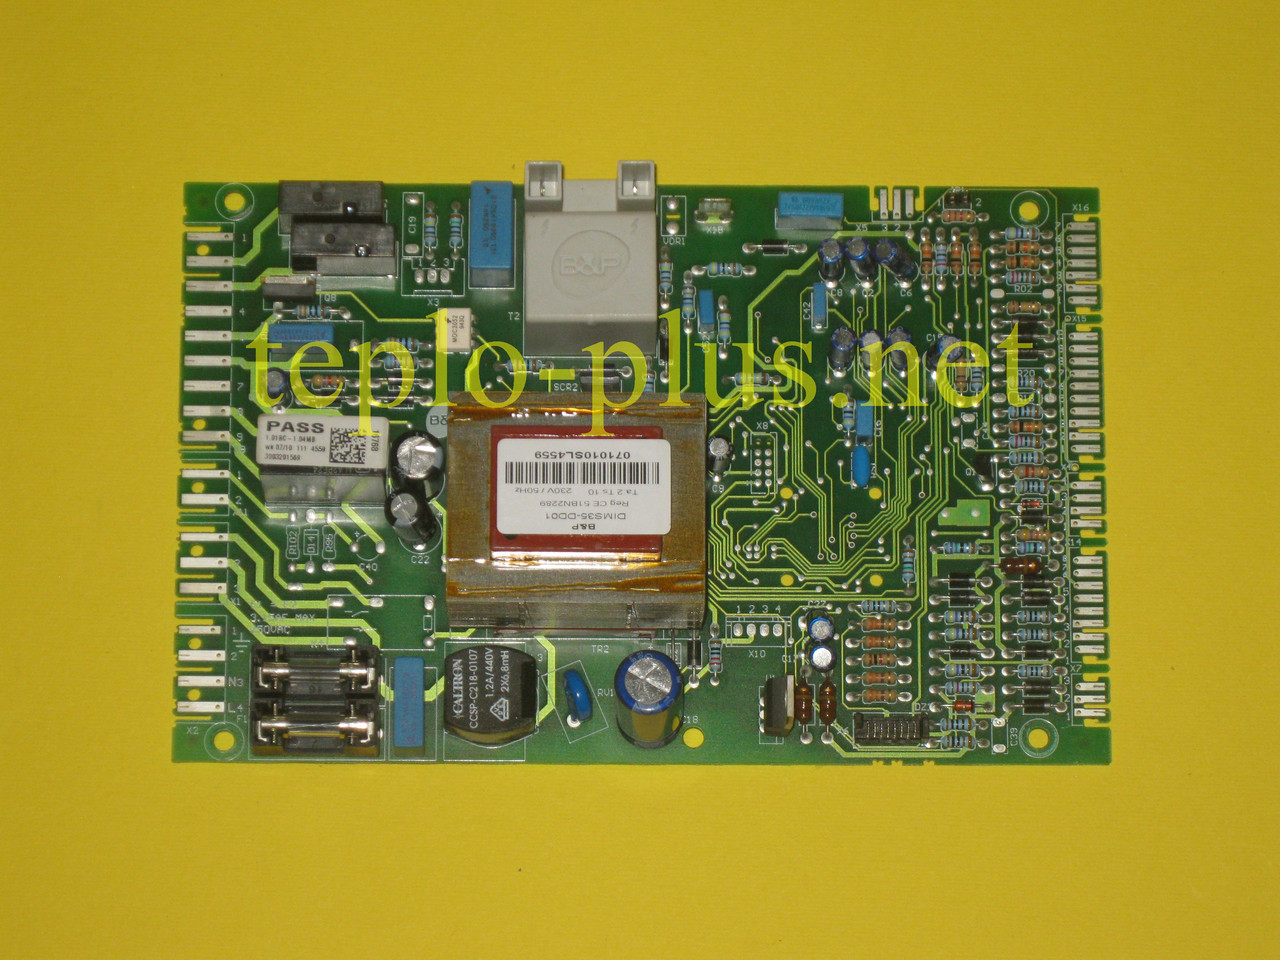 Плата управления D003201569 (3003201569) Demrad Nitron HKF224, HKF230